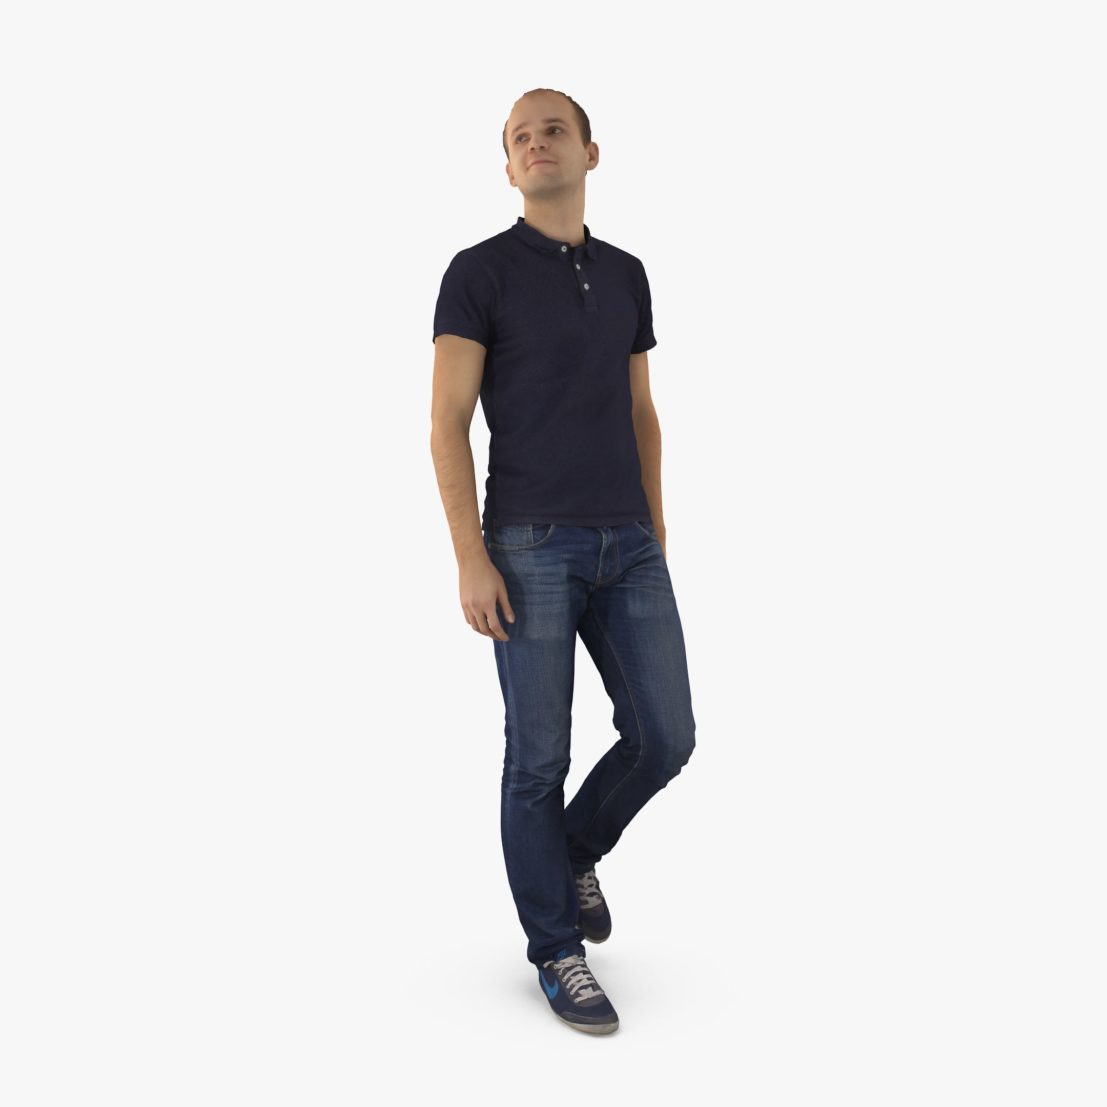 City Guy Walking 3D Model | 3DTree Scanning Studio